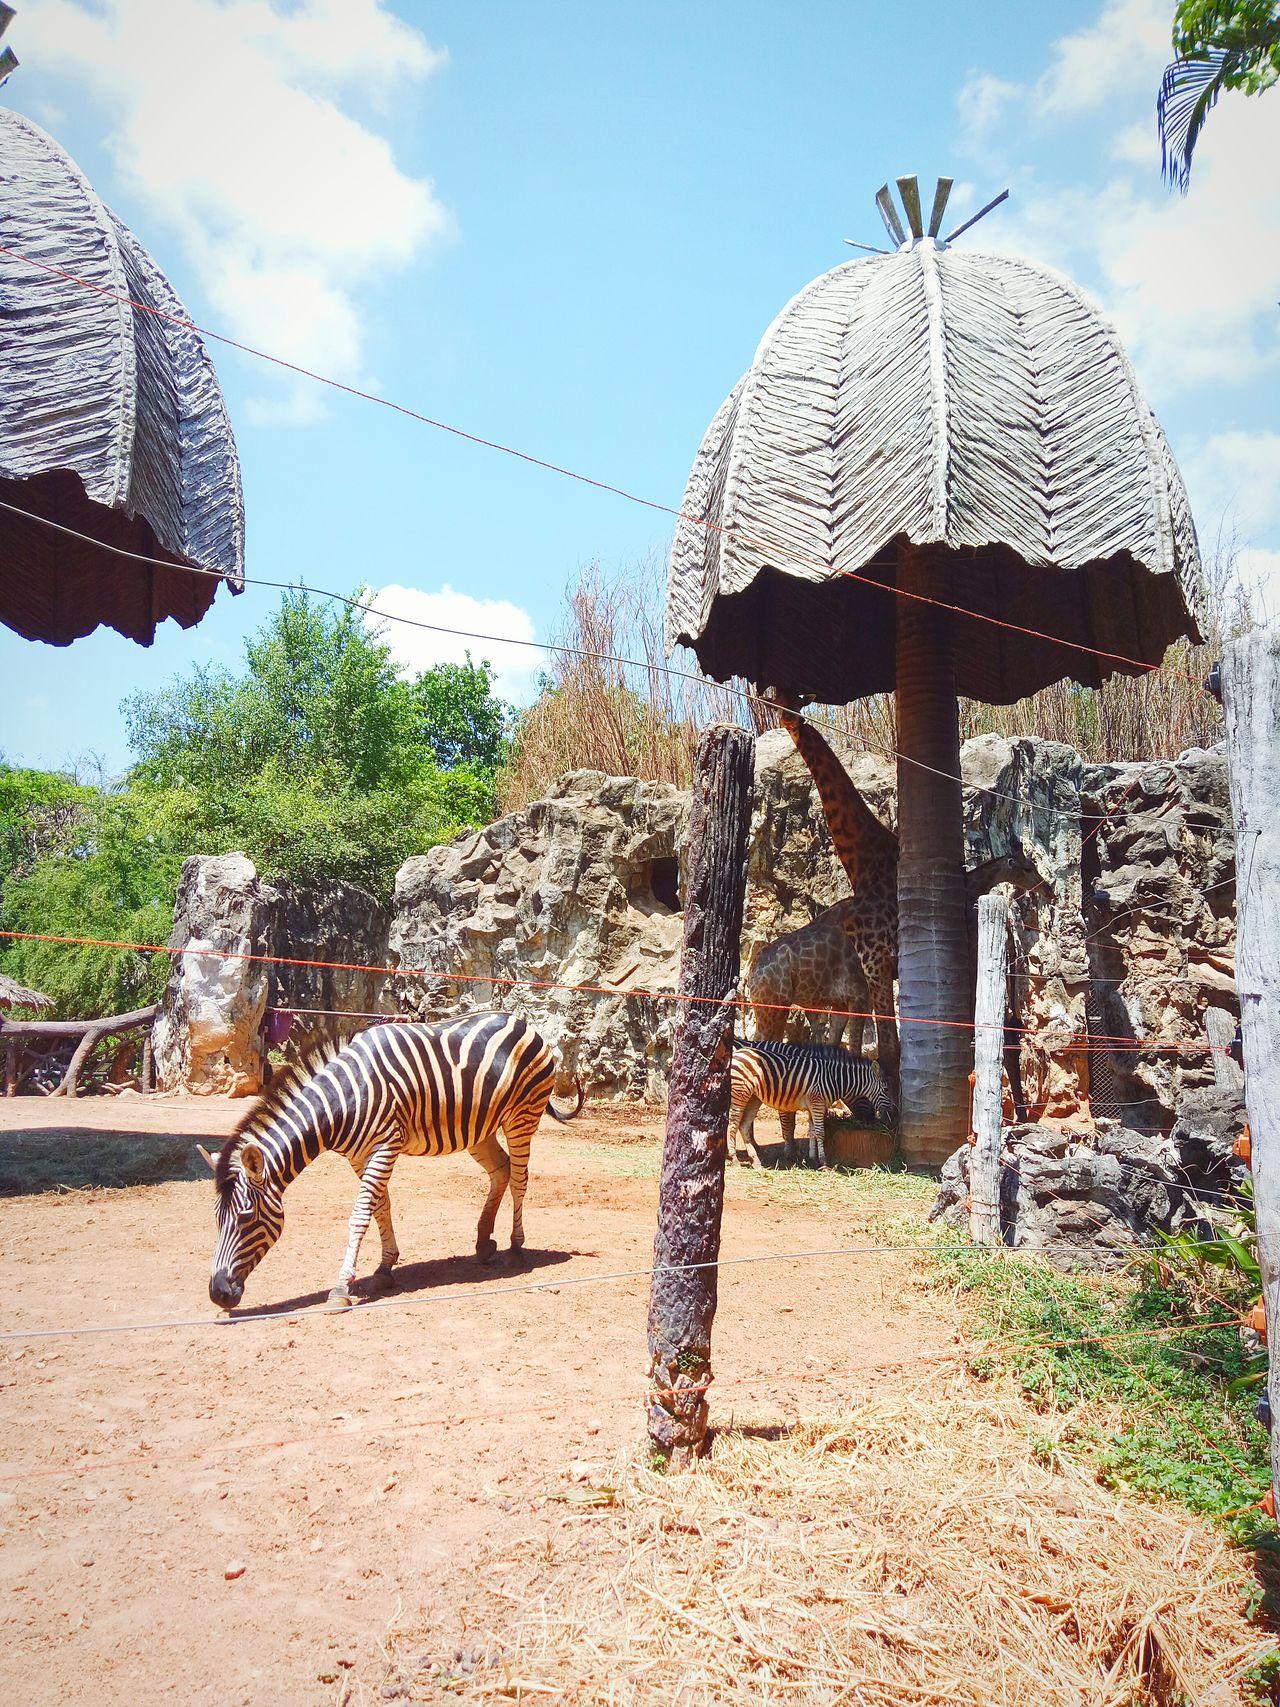 Zebra Animal Themes Animals In The Wild Large Group Of Animals Giraffe No People Sky Safari Animals Outdoors Animal Wildlife Elephant Mammal Tree Nature Day Grass Water African Elephant Leopard